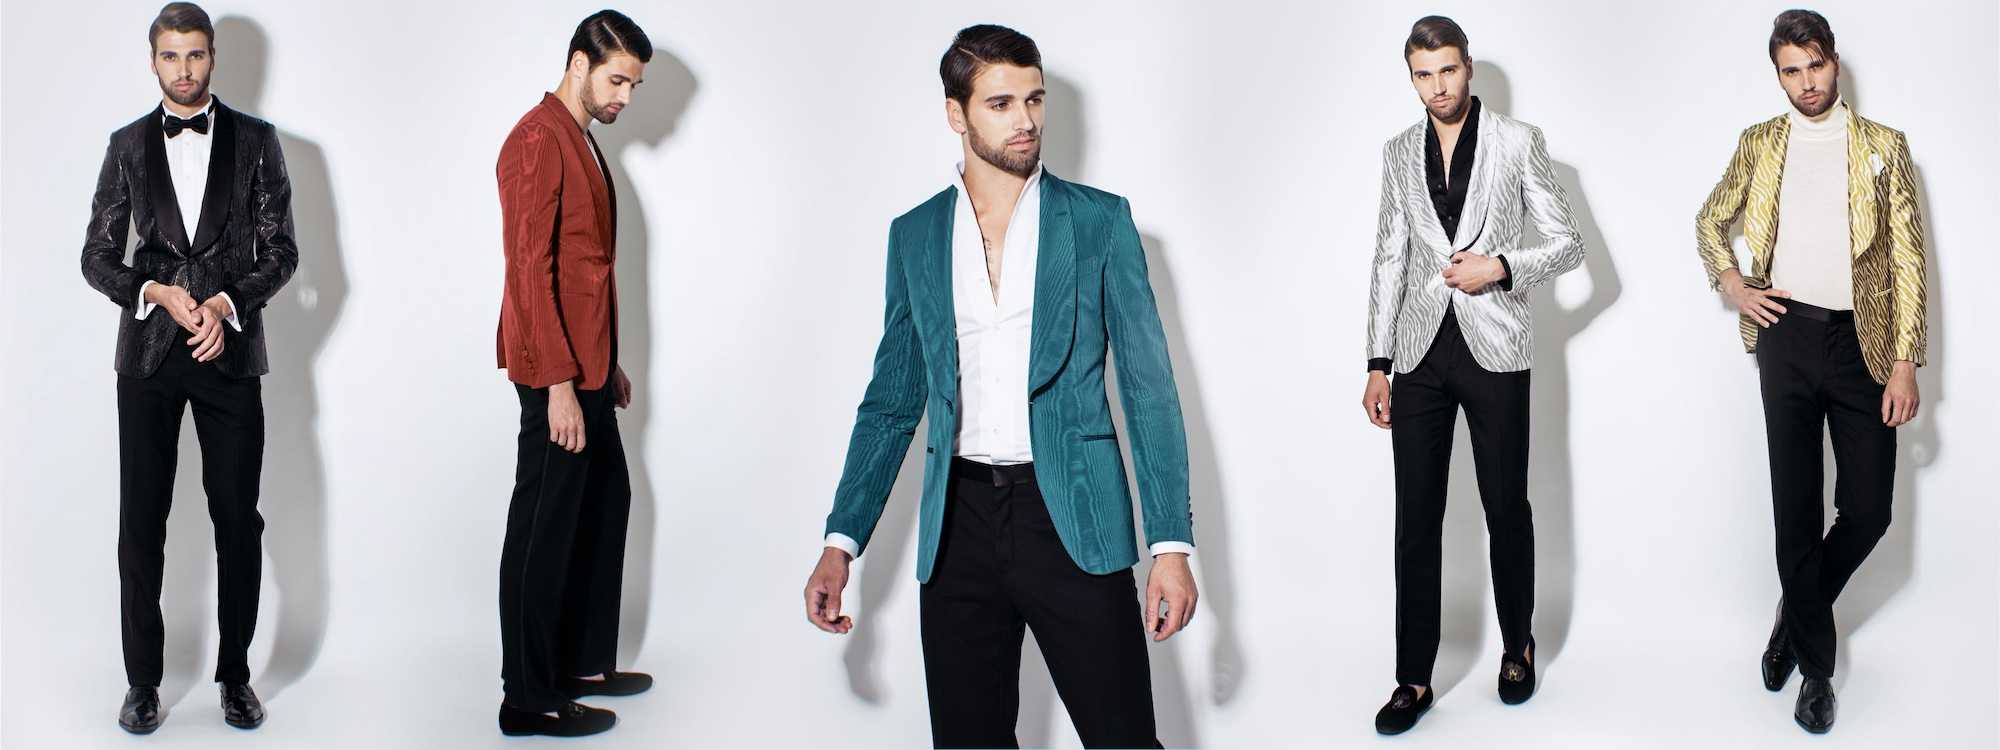 Fashion photography studio singapore services asia photographer photoshoot model man clothing